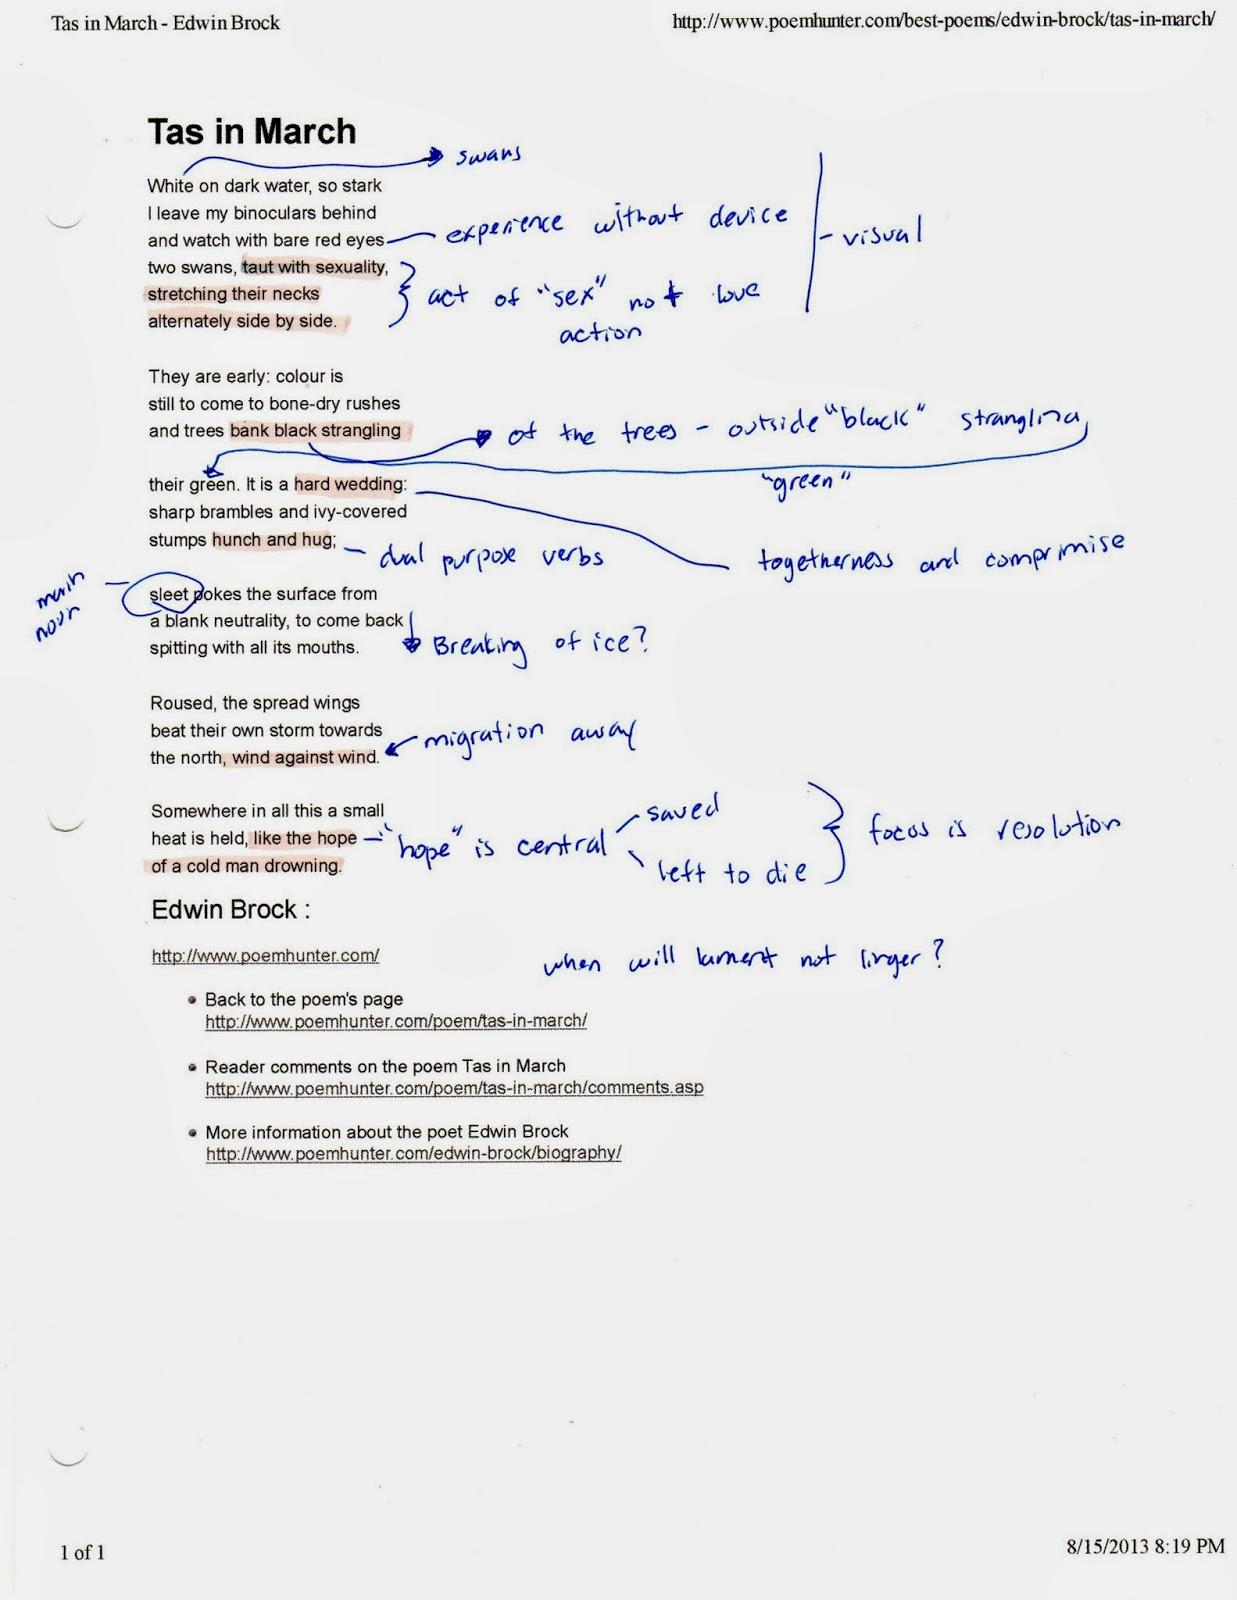 Stanzas written in dejection explication - Research paper Sample